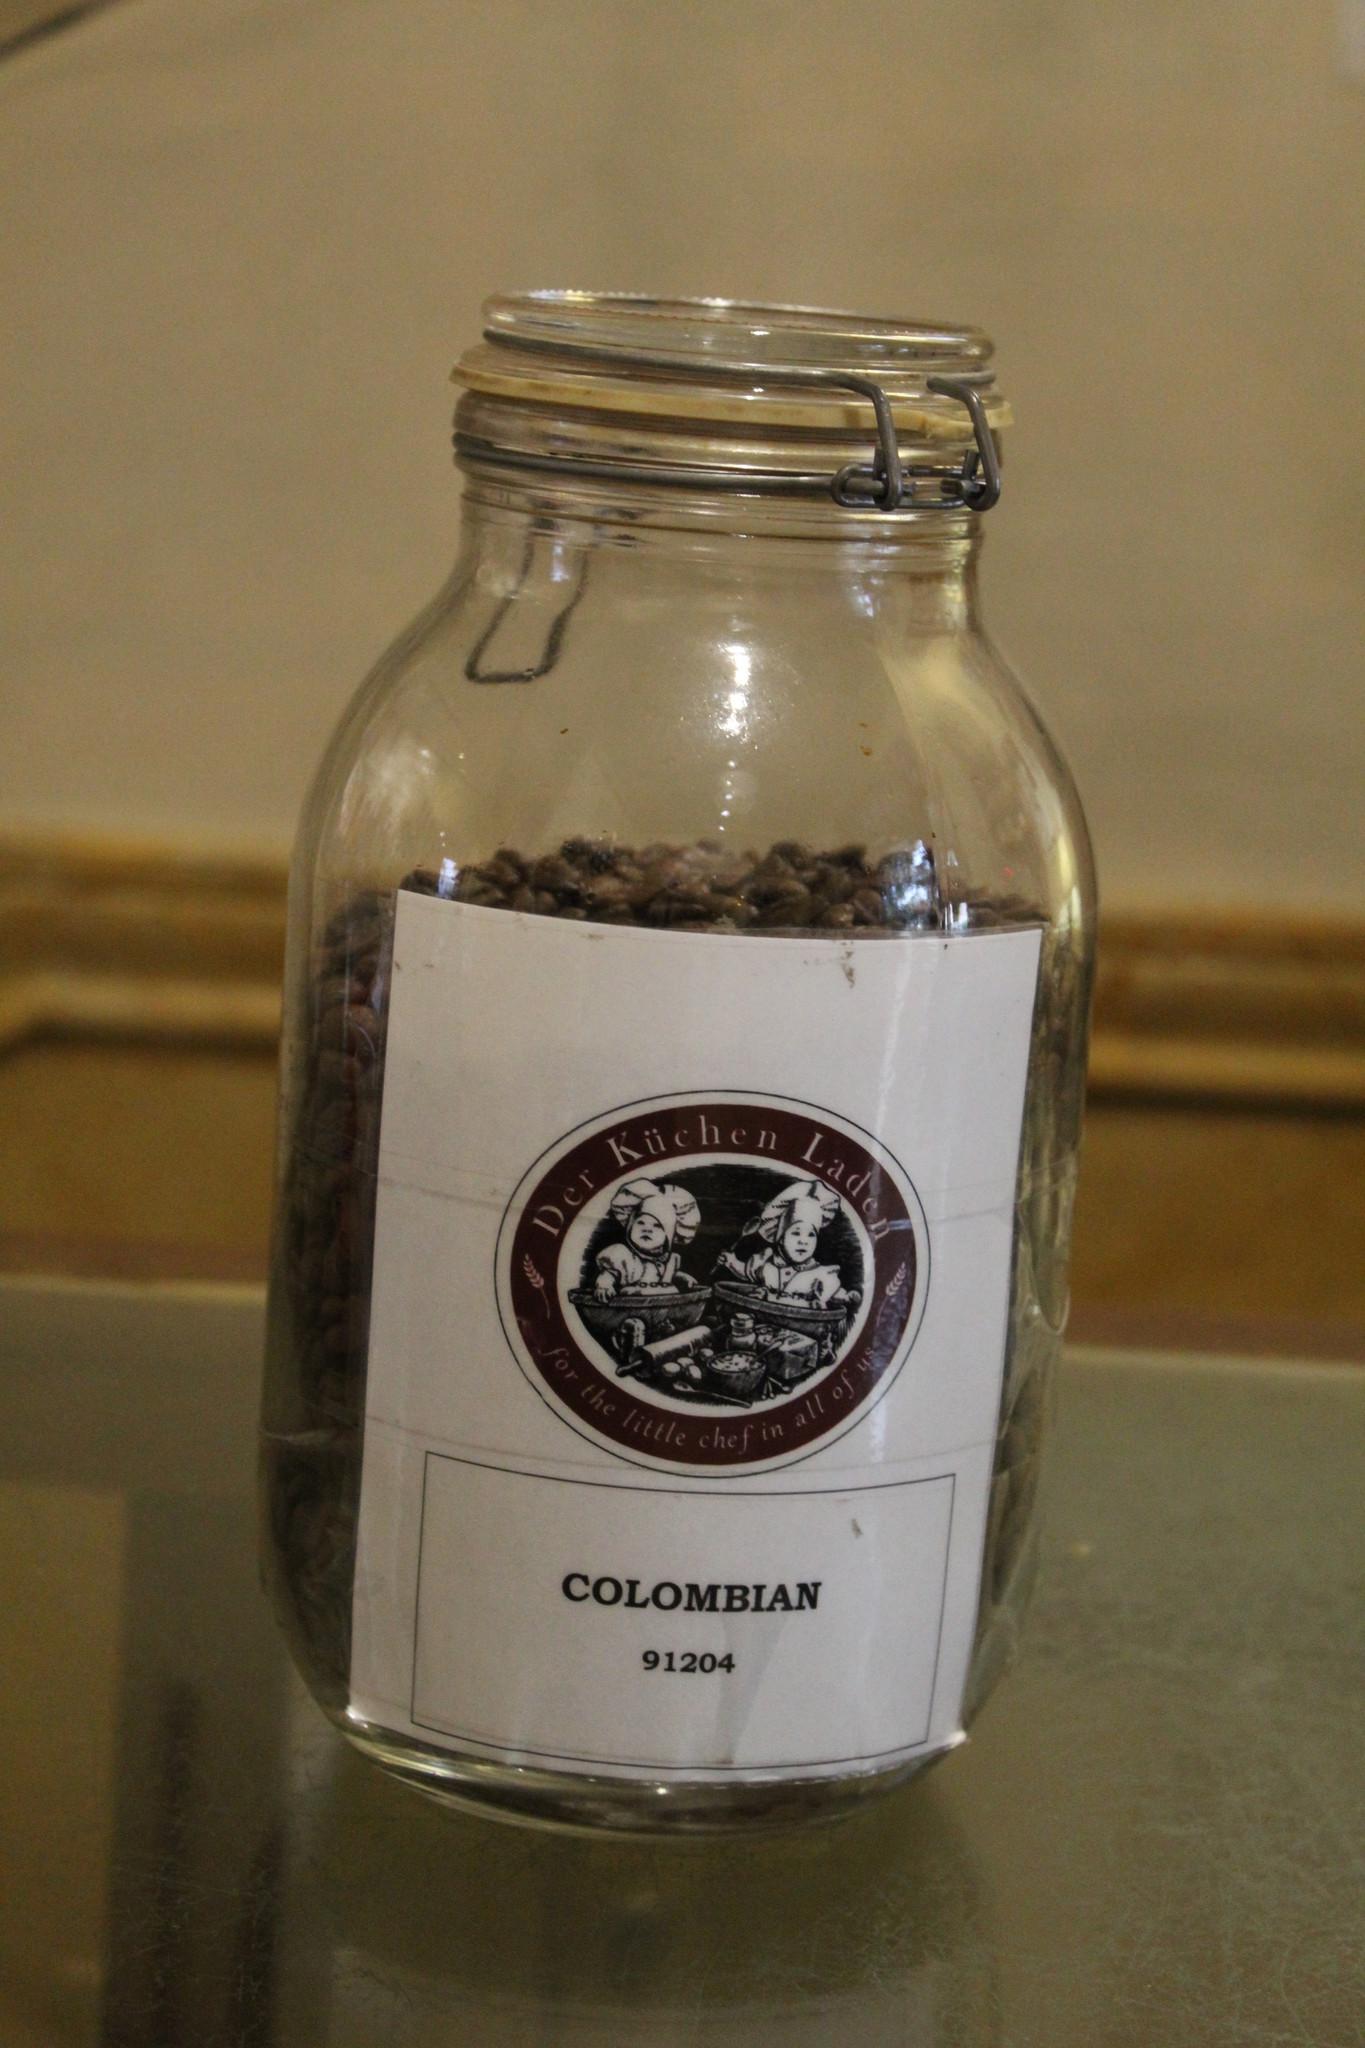 COLOMBIAN-1